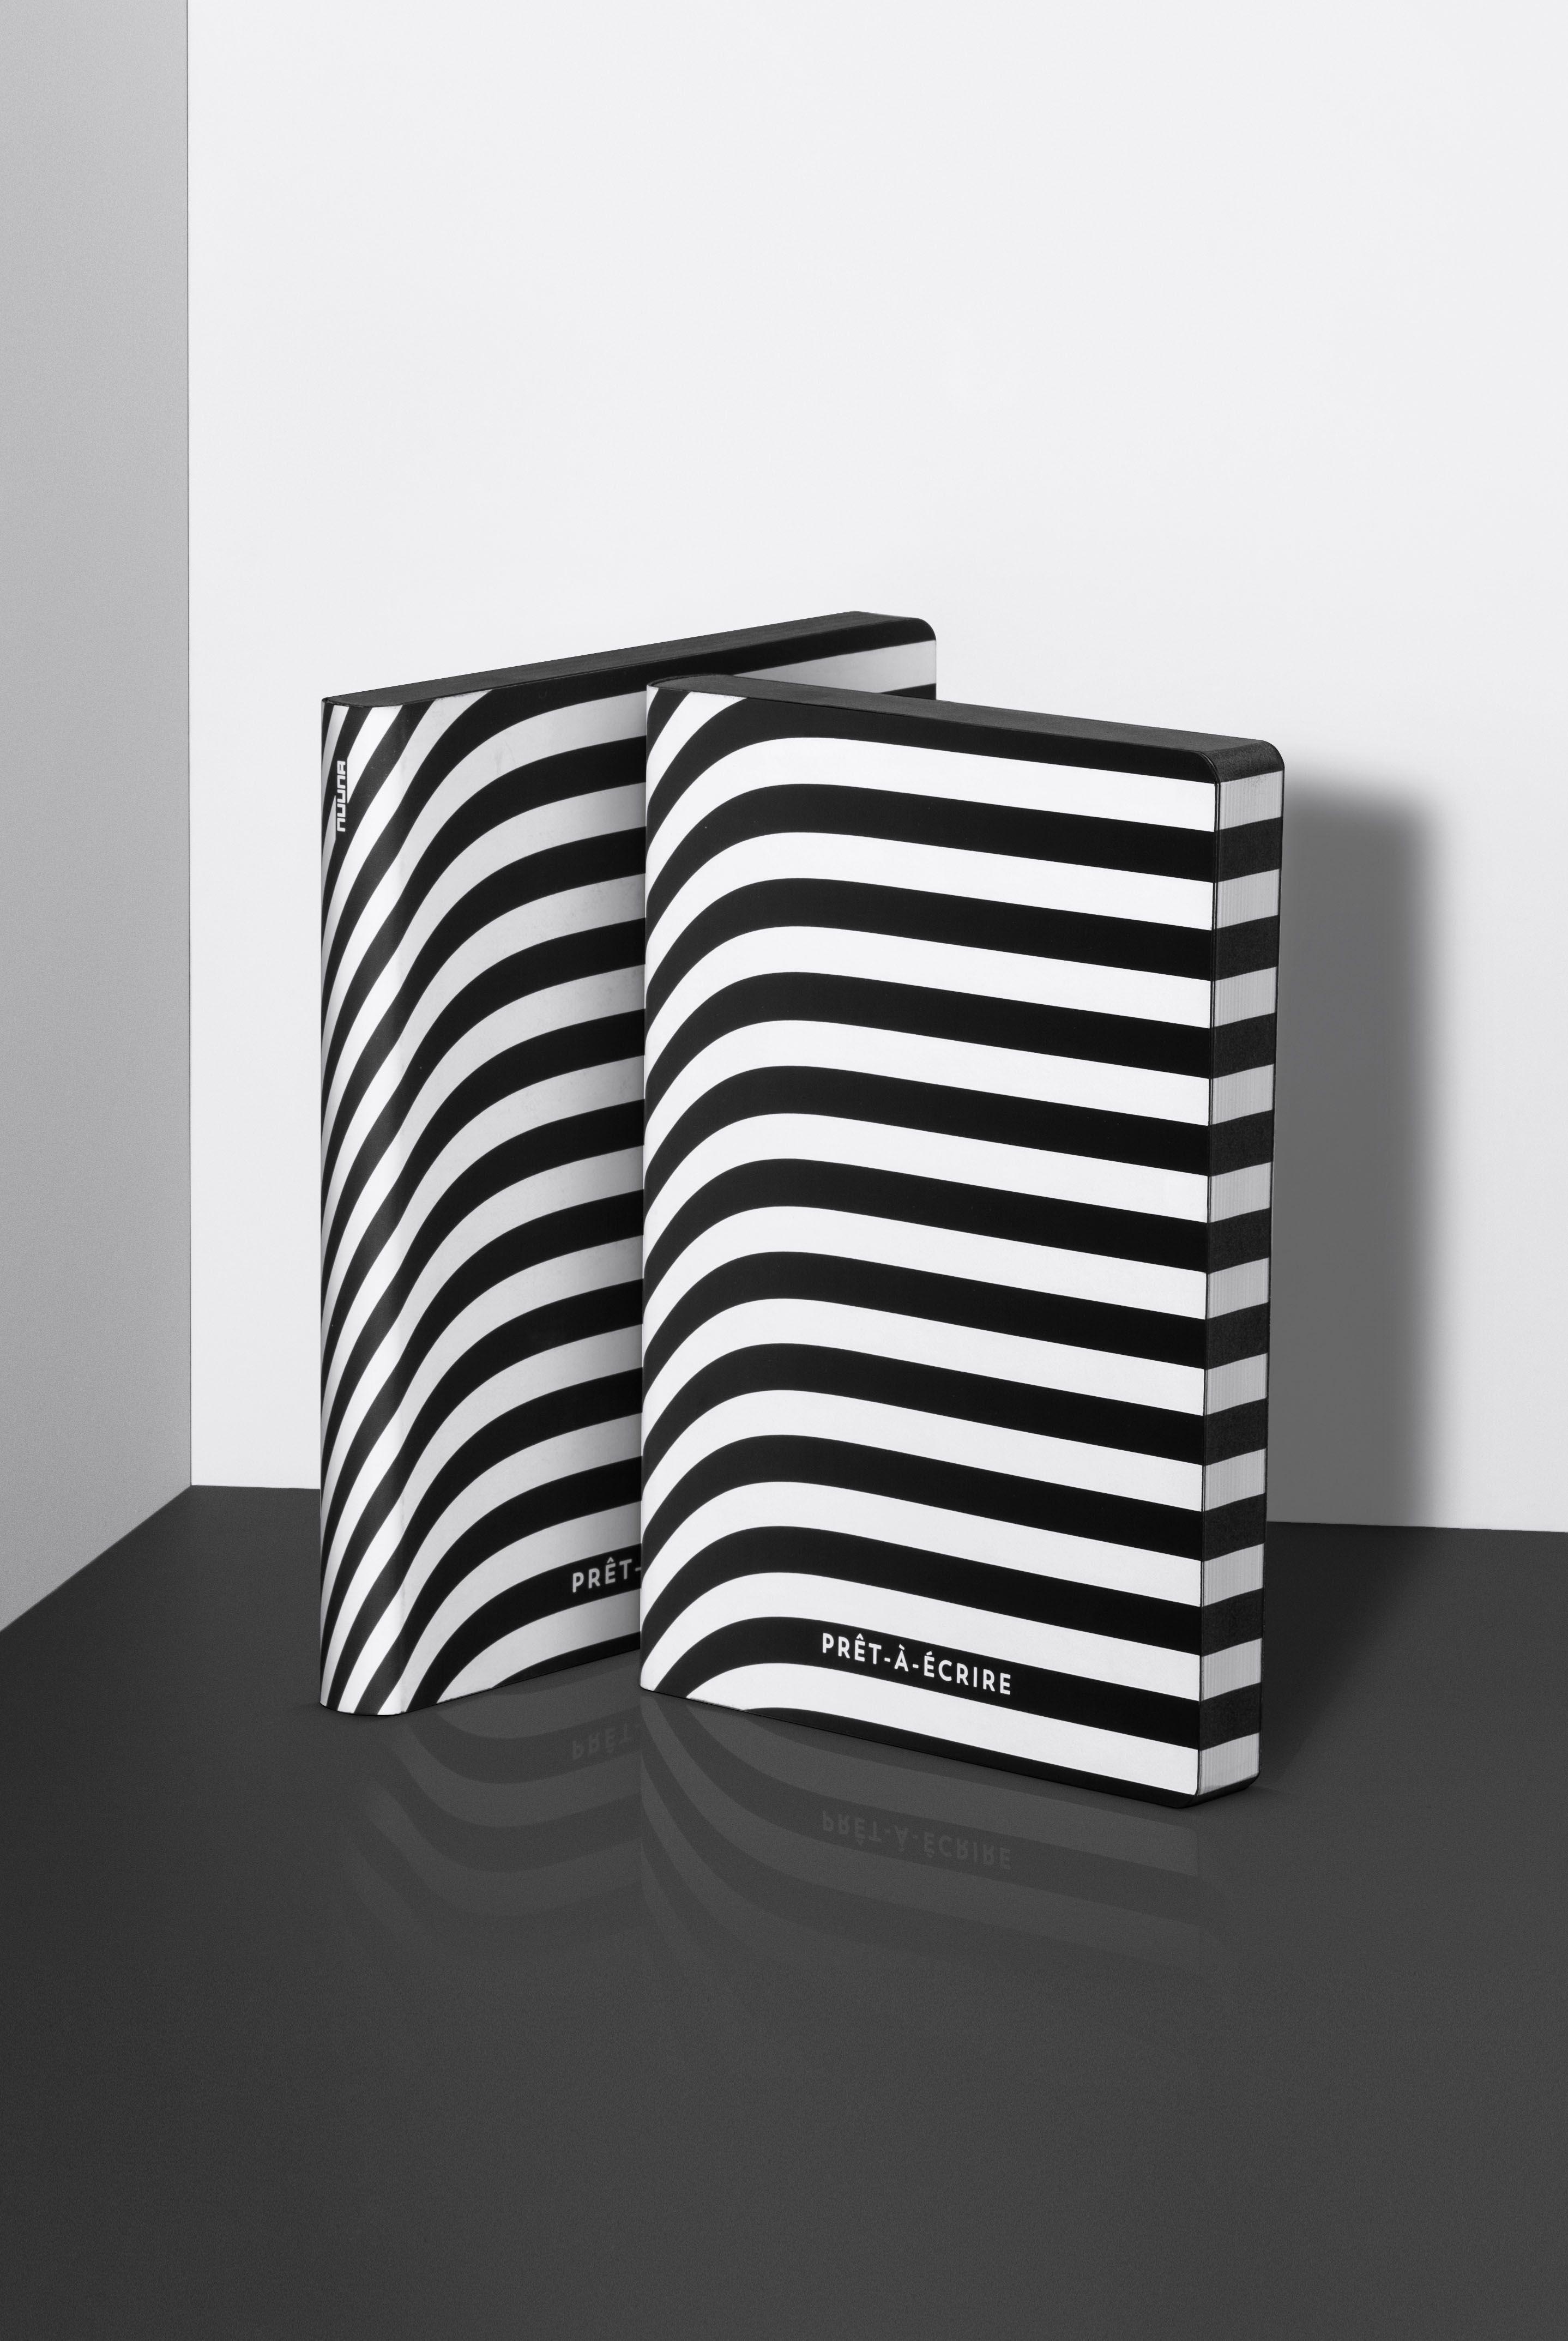 Nuuna Graphic Notebook Dot Grid Large Pret A Ecrire